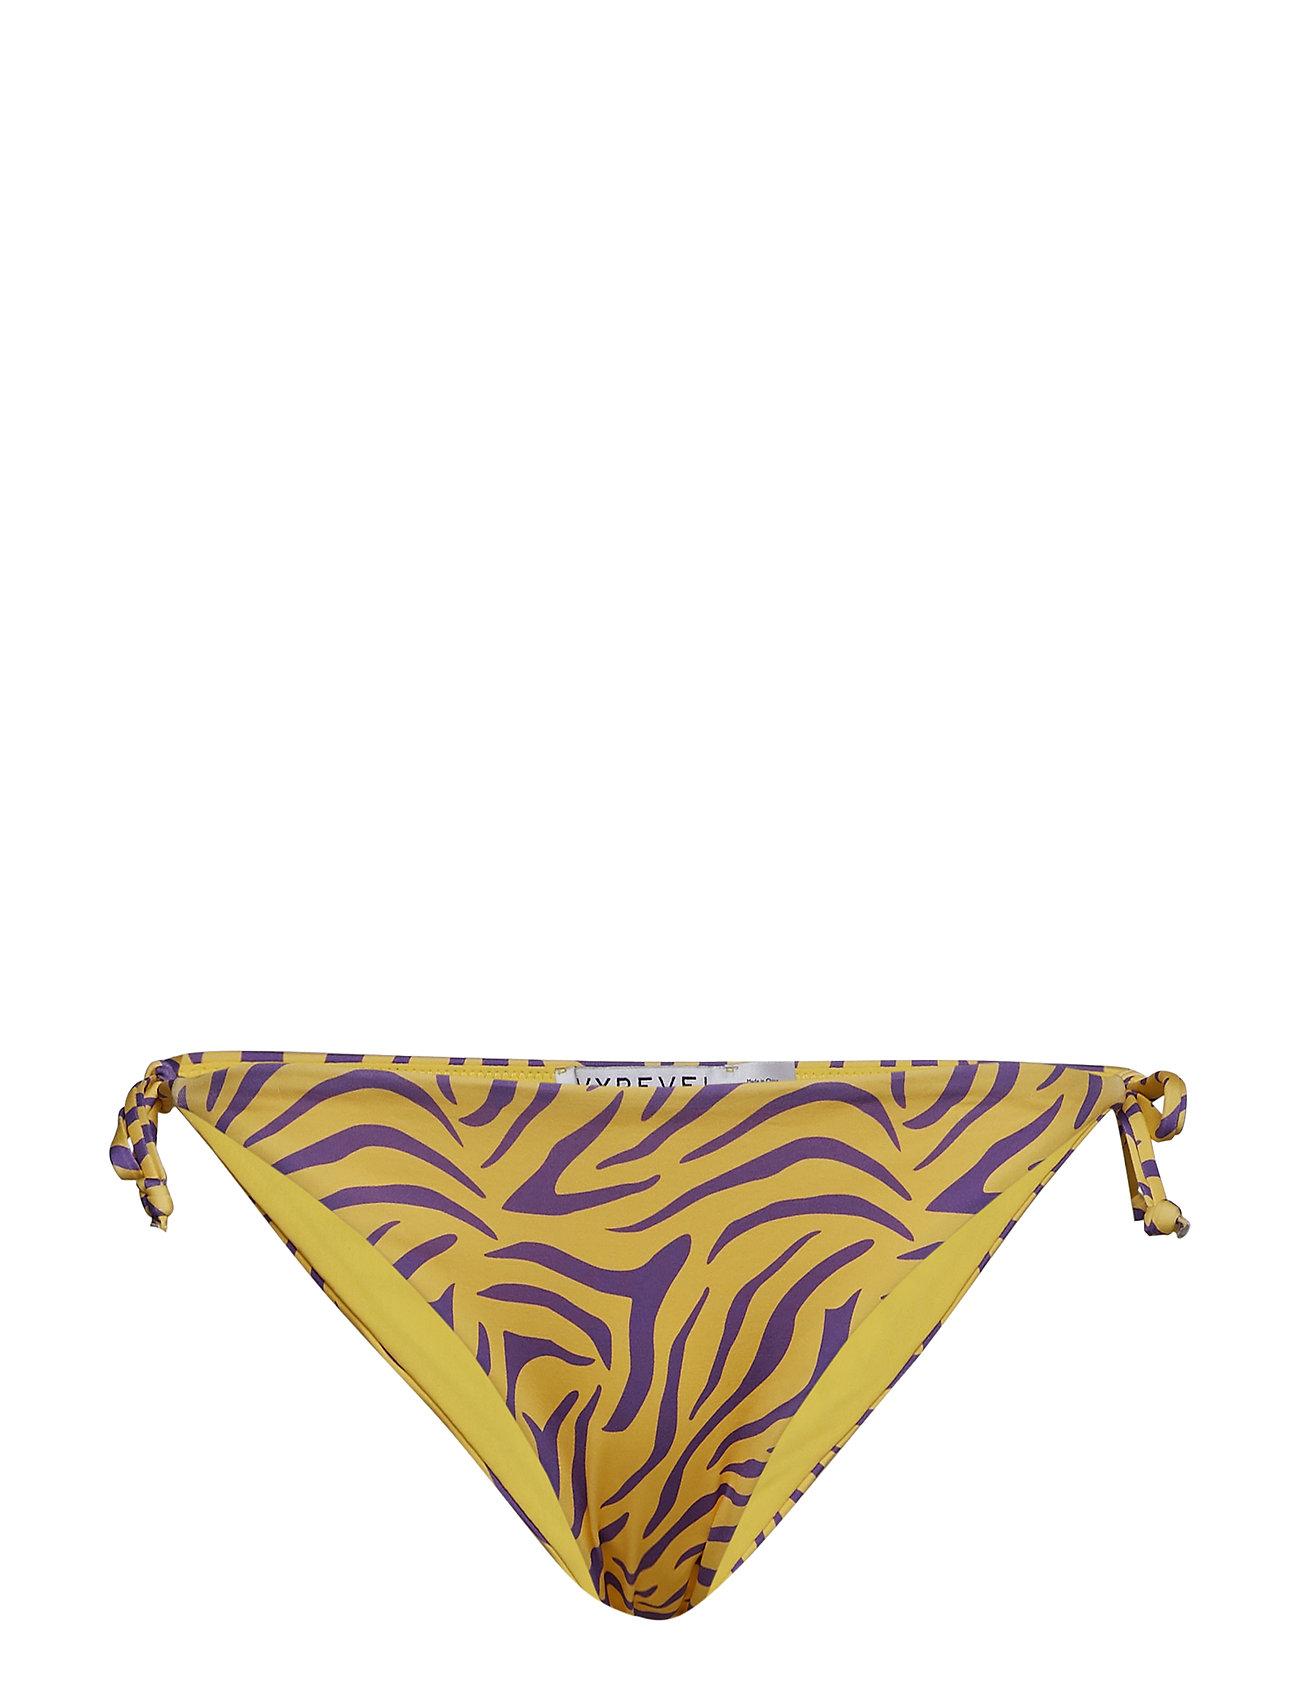 Ivyrevel Tie Side Bikini Bottom - YELLOW/PURPLE ZEBRA PRINT